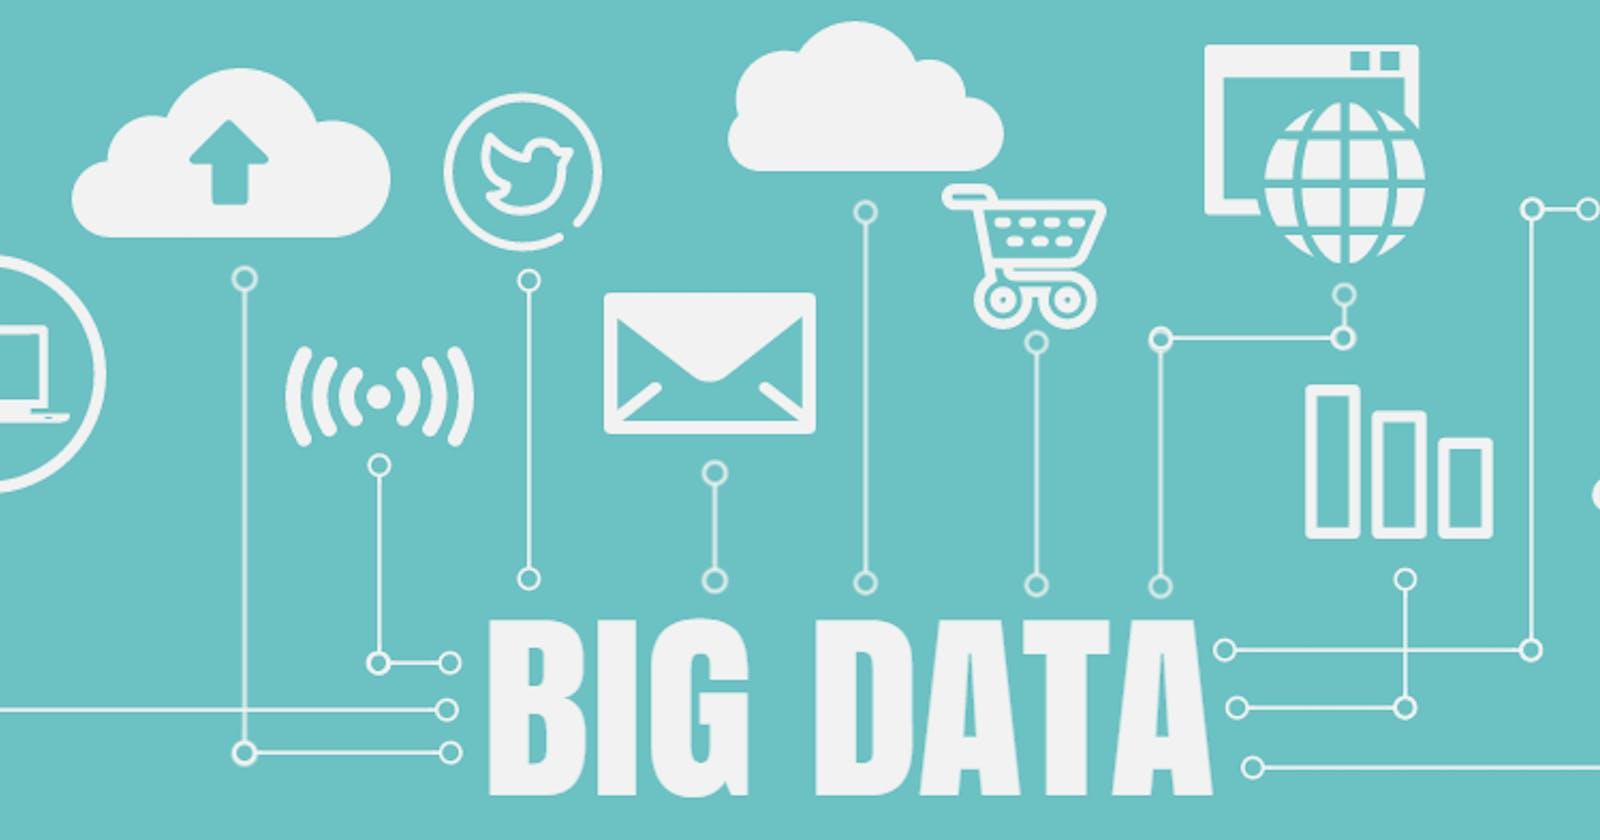 Install Big Data tools ( Hadoop, Spark, ...)